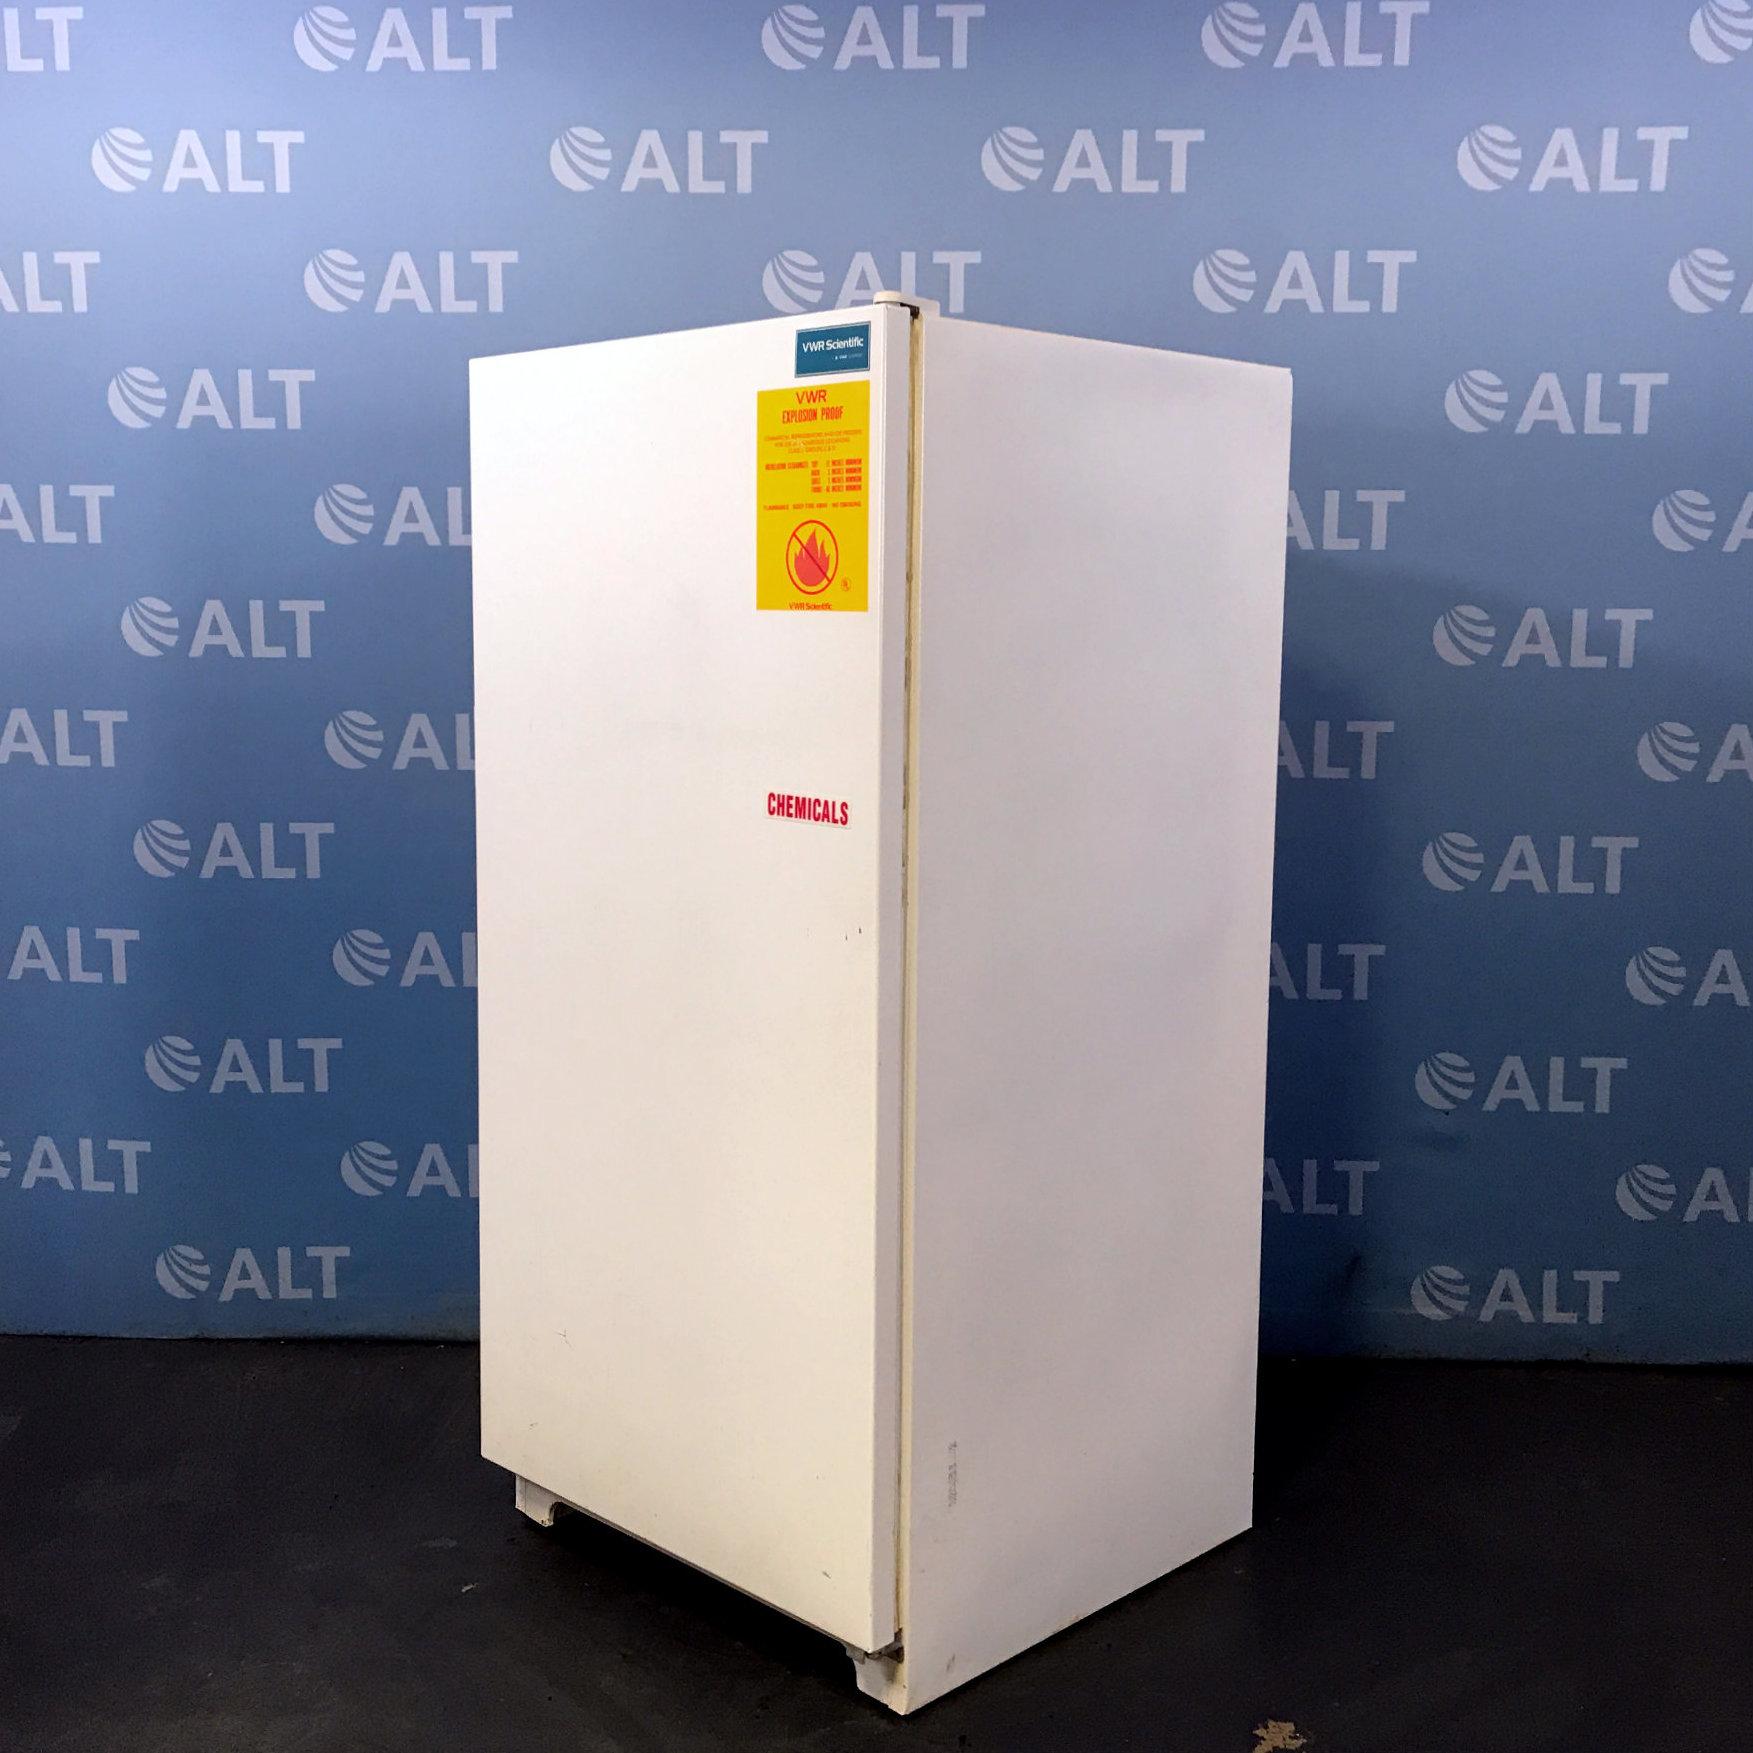 VWR Scientific U2016XABA -20 Explosion Proof Freezer Image